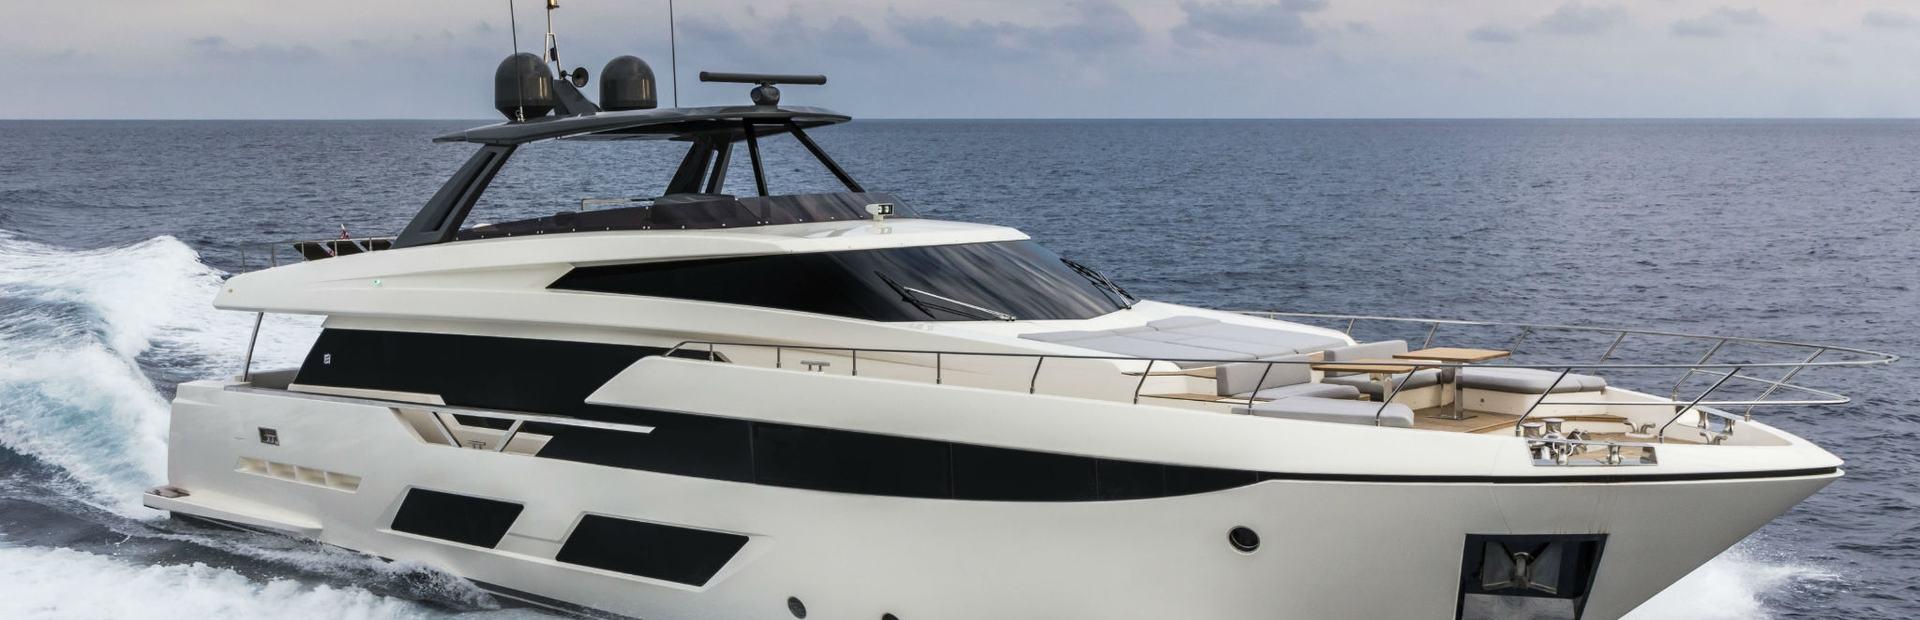 Ferretti Yachts 920 Yacht Charter